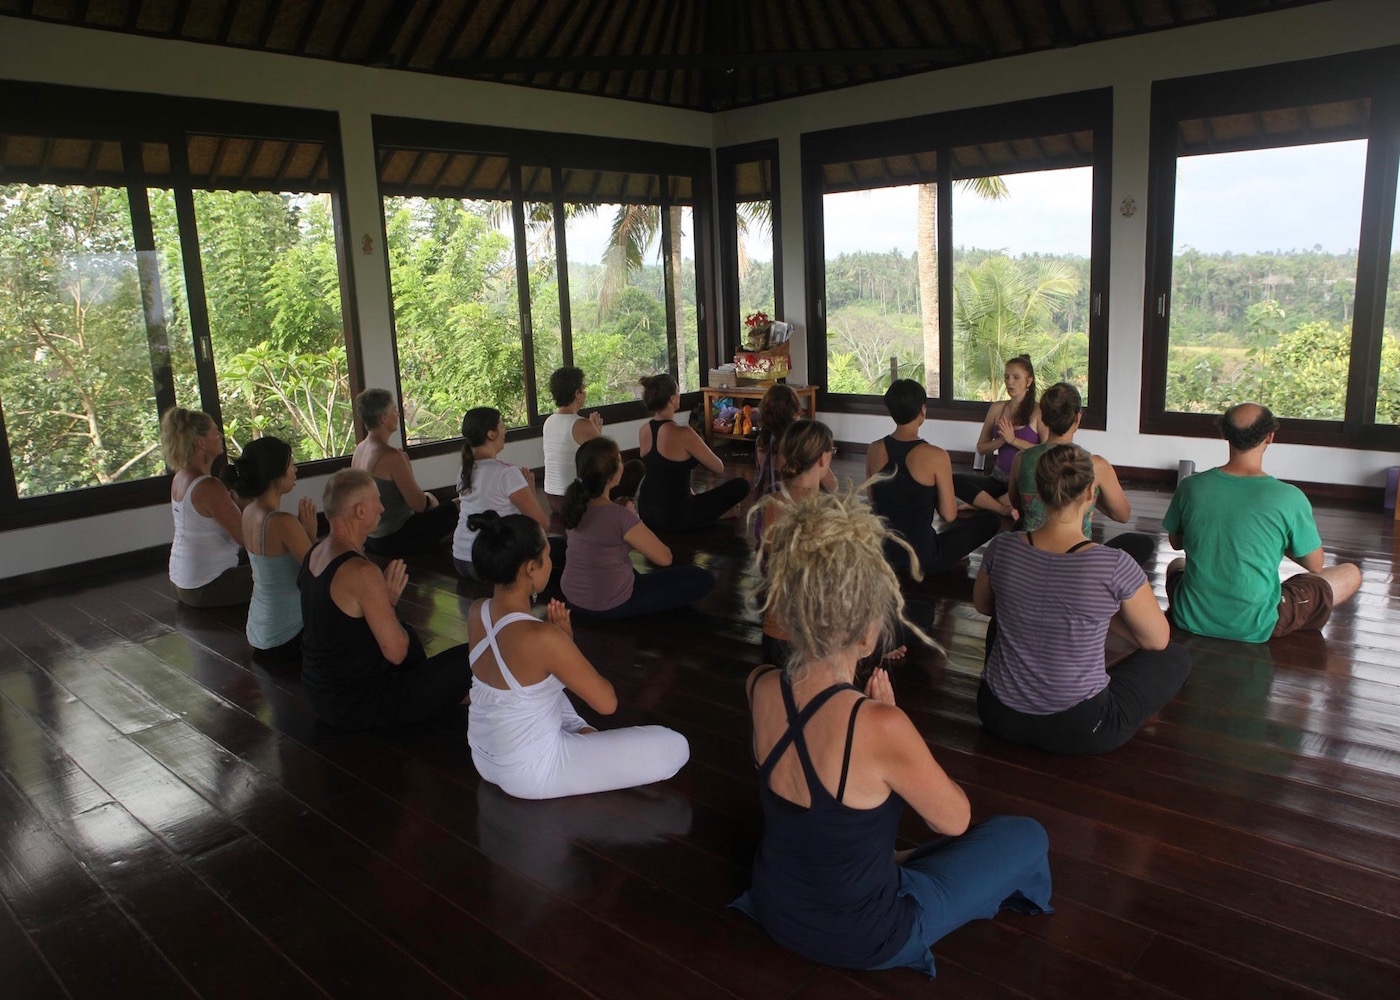 Meditation at Intuitive Flow yoga studio in Ubud, Bali, Indonesia